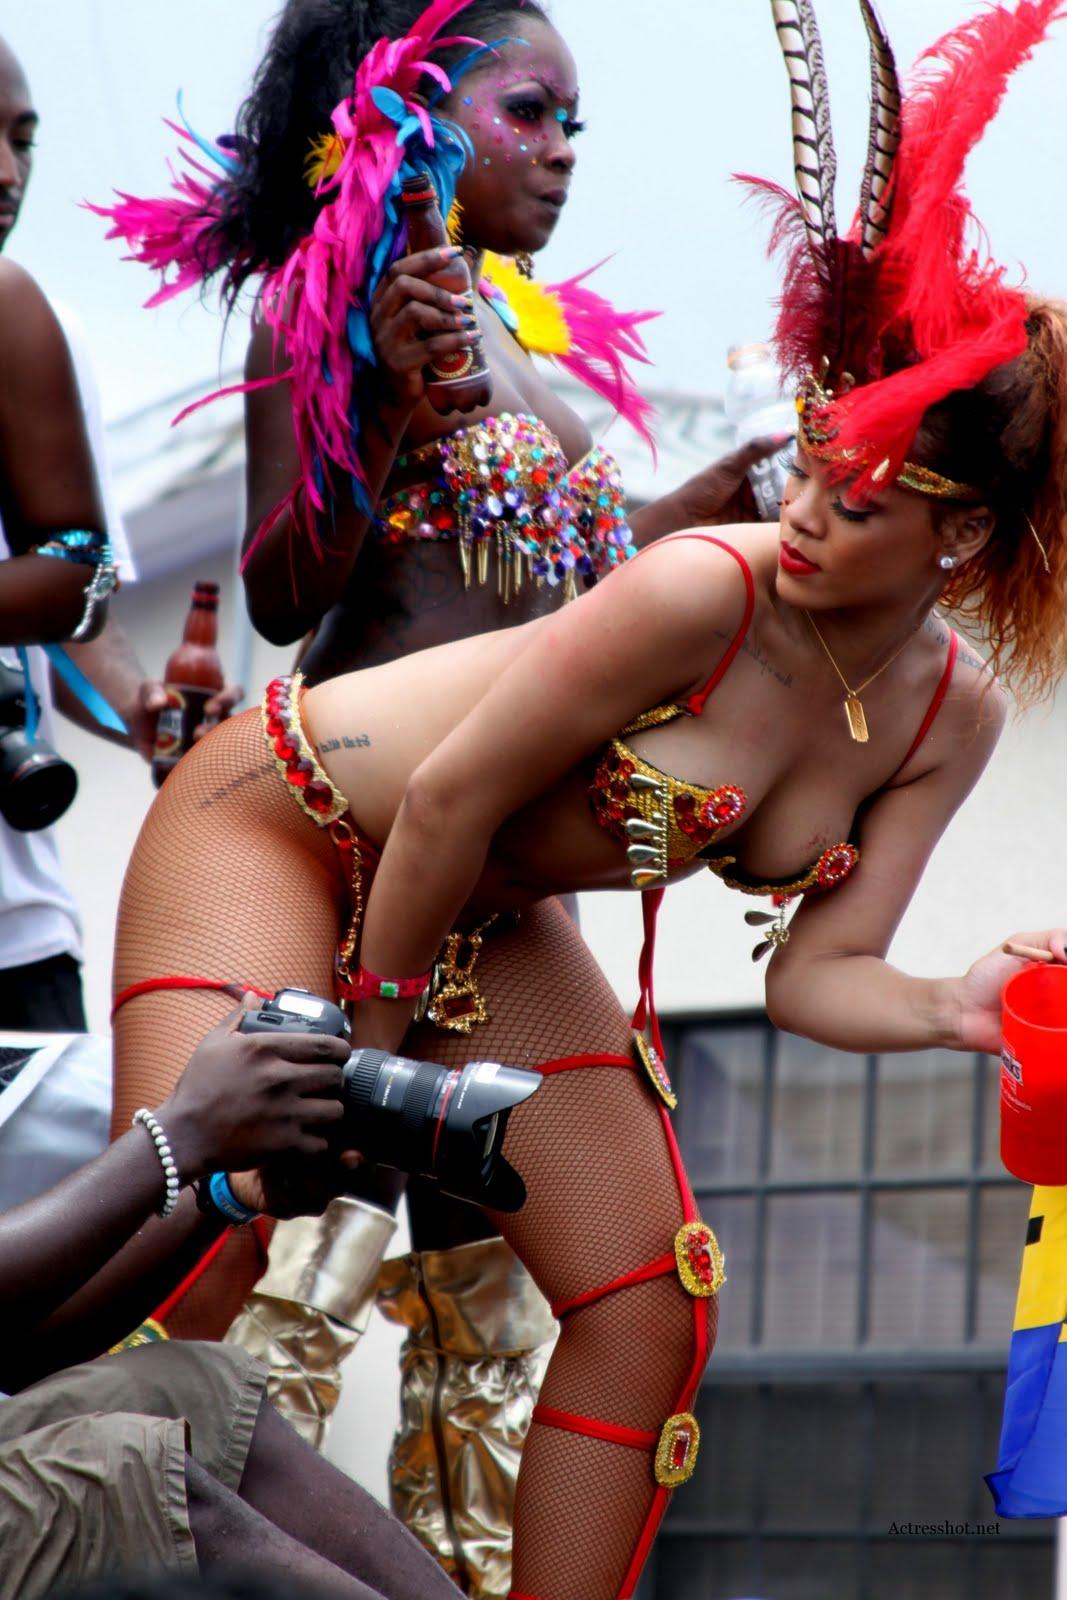 http://3.bp.blogspot.com/-cc4TmohjFtQ/TlO75t0sgII/AAAAAAAAE68/chR8obYqgE0/s1600/More-photos-of-Rihanna-at-Kadooment-Day-Parade-in-Barbados-0fefk01.jpg